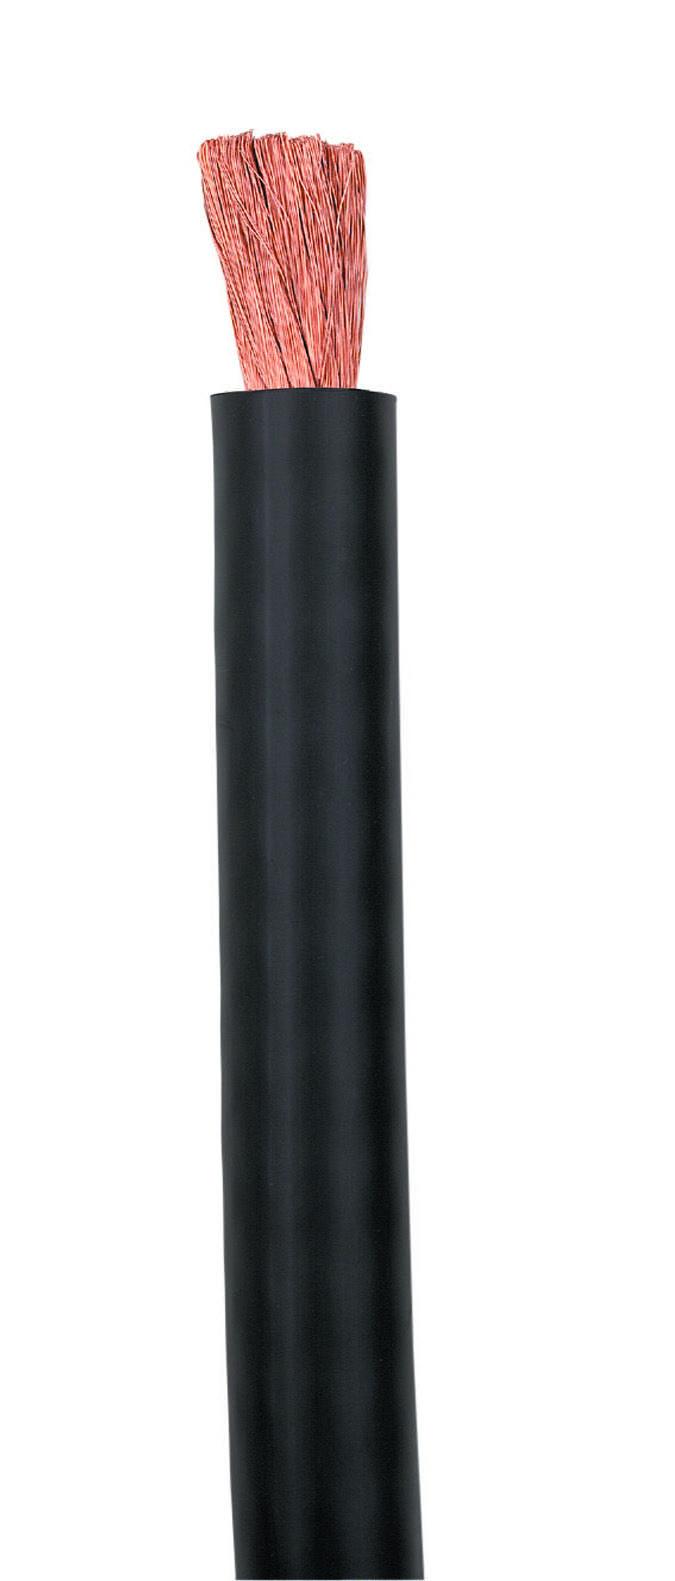 2/0 BLACK WELDING CABLE (CUT REEL)